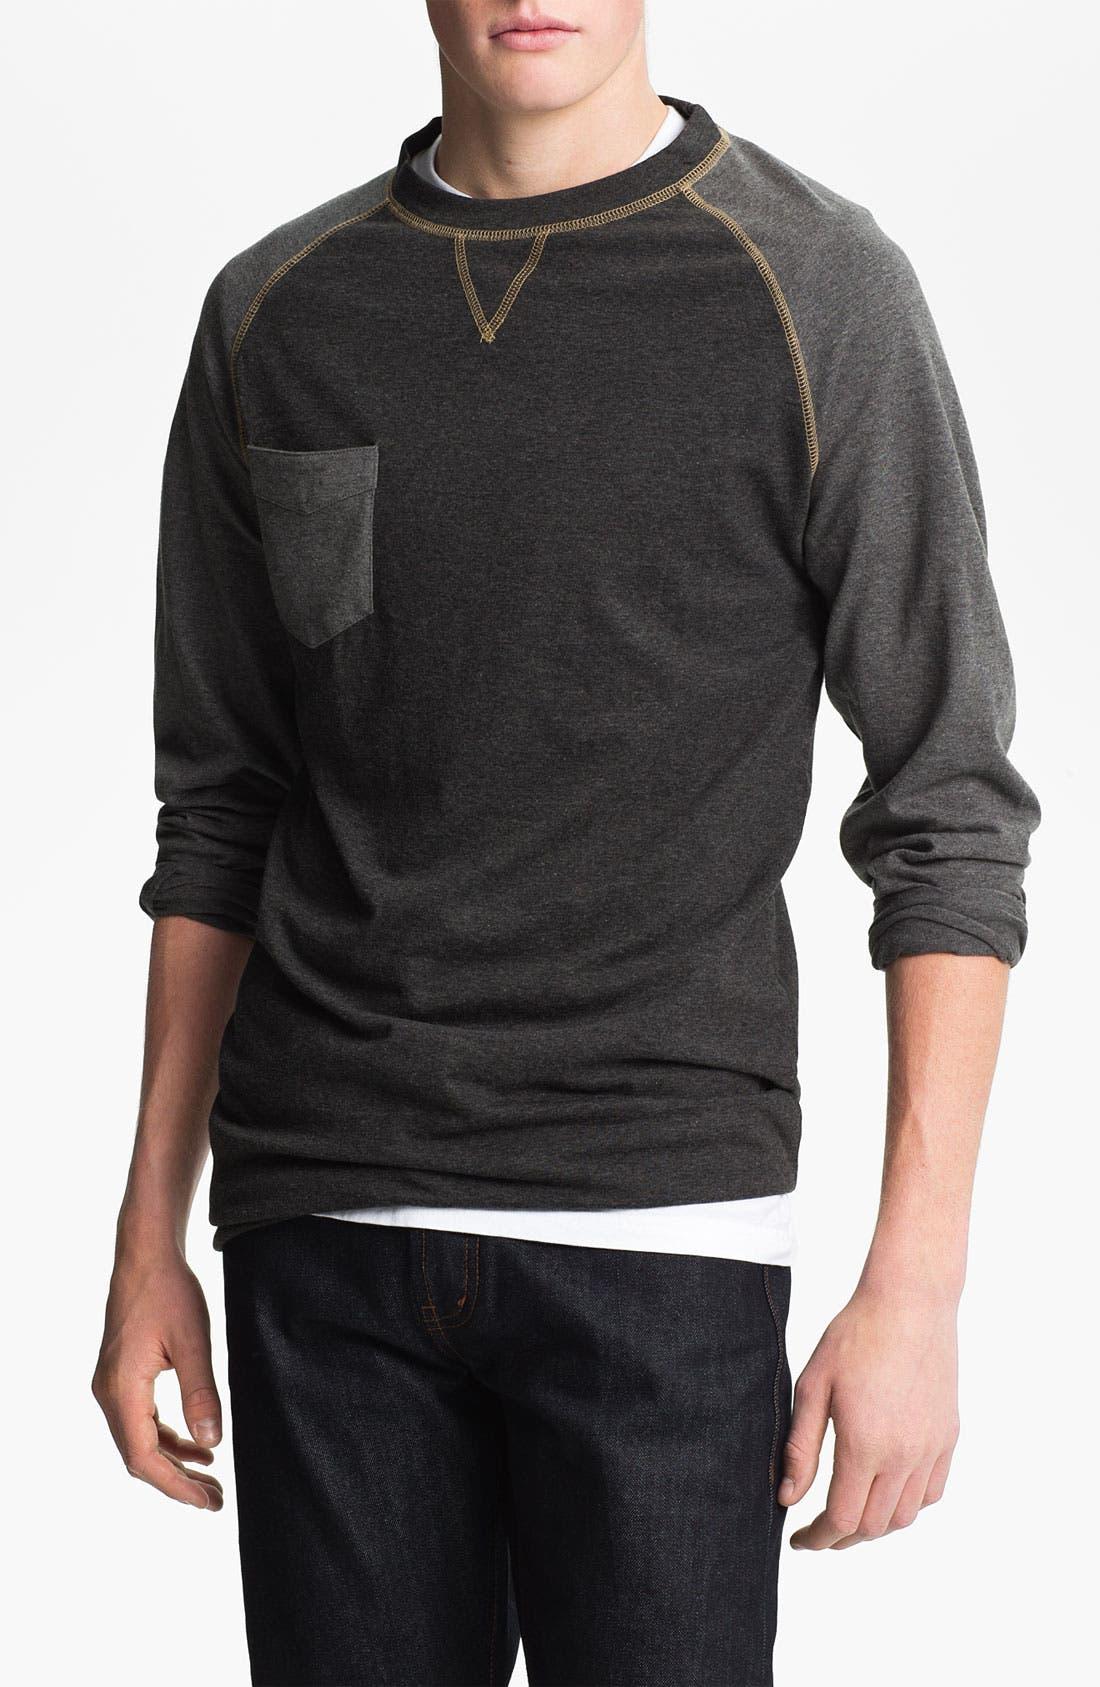 Alternate Image 1 Selected - Ezekiel 'Gym Class' Crewneck Sweatshirt